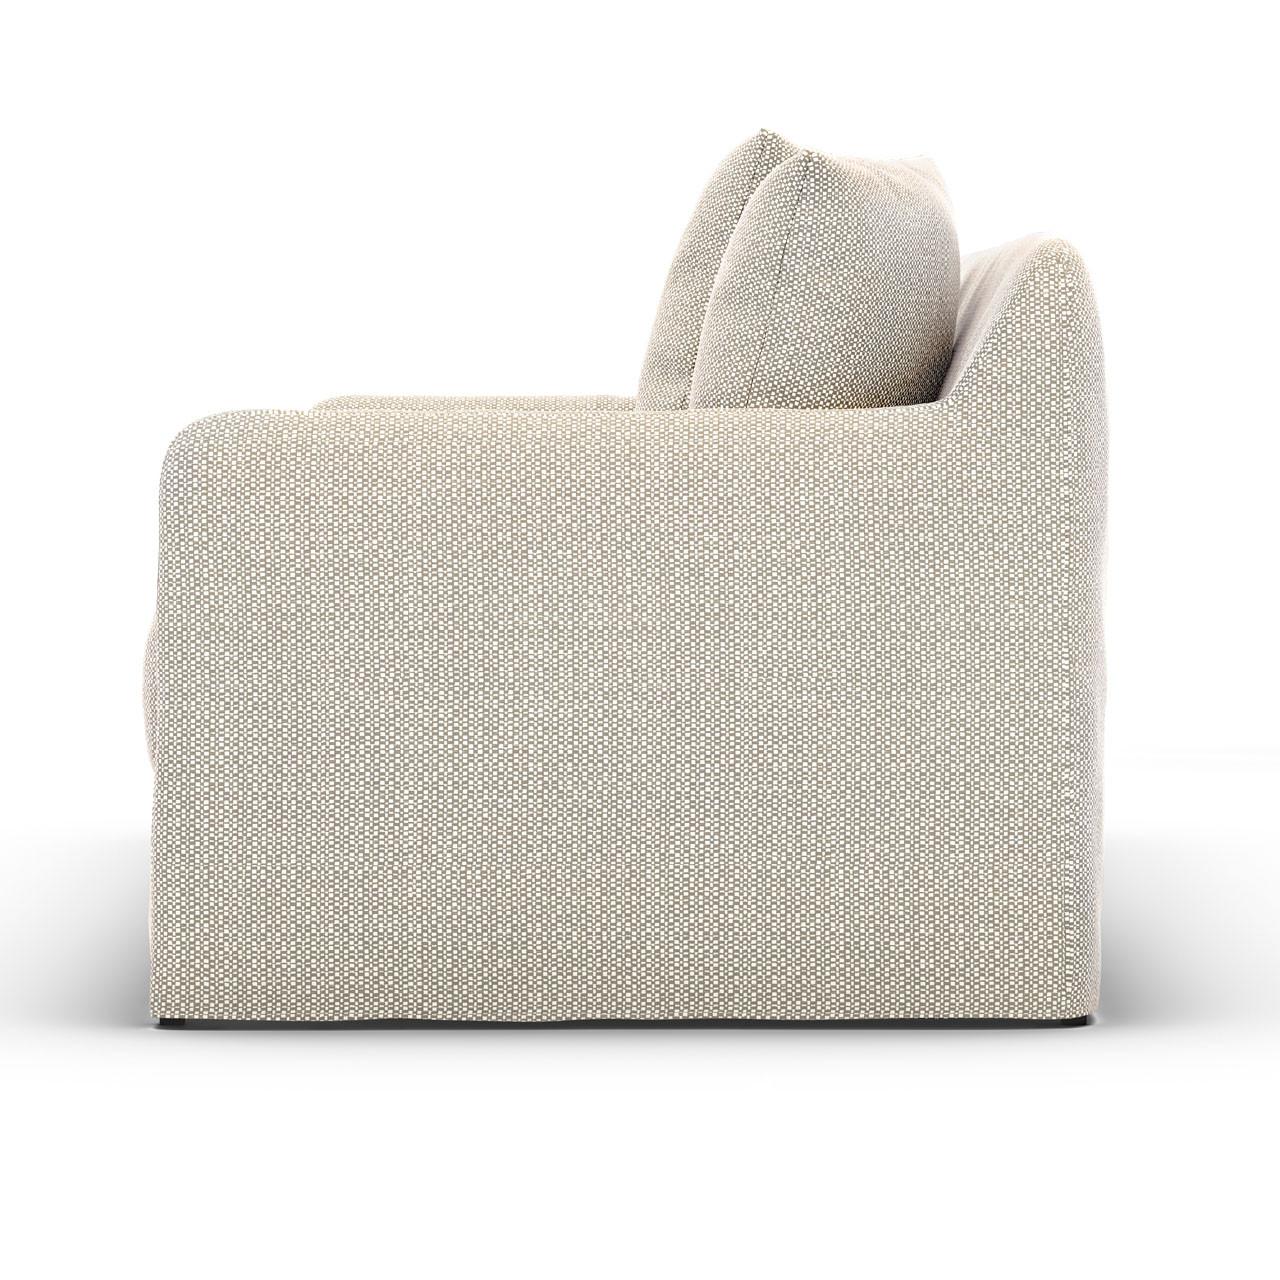 "Wenlock Outdoor Sofa - 90"" Stone Grey"